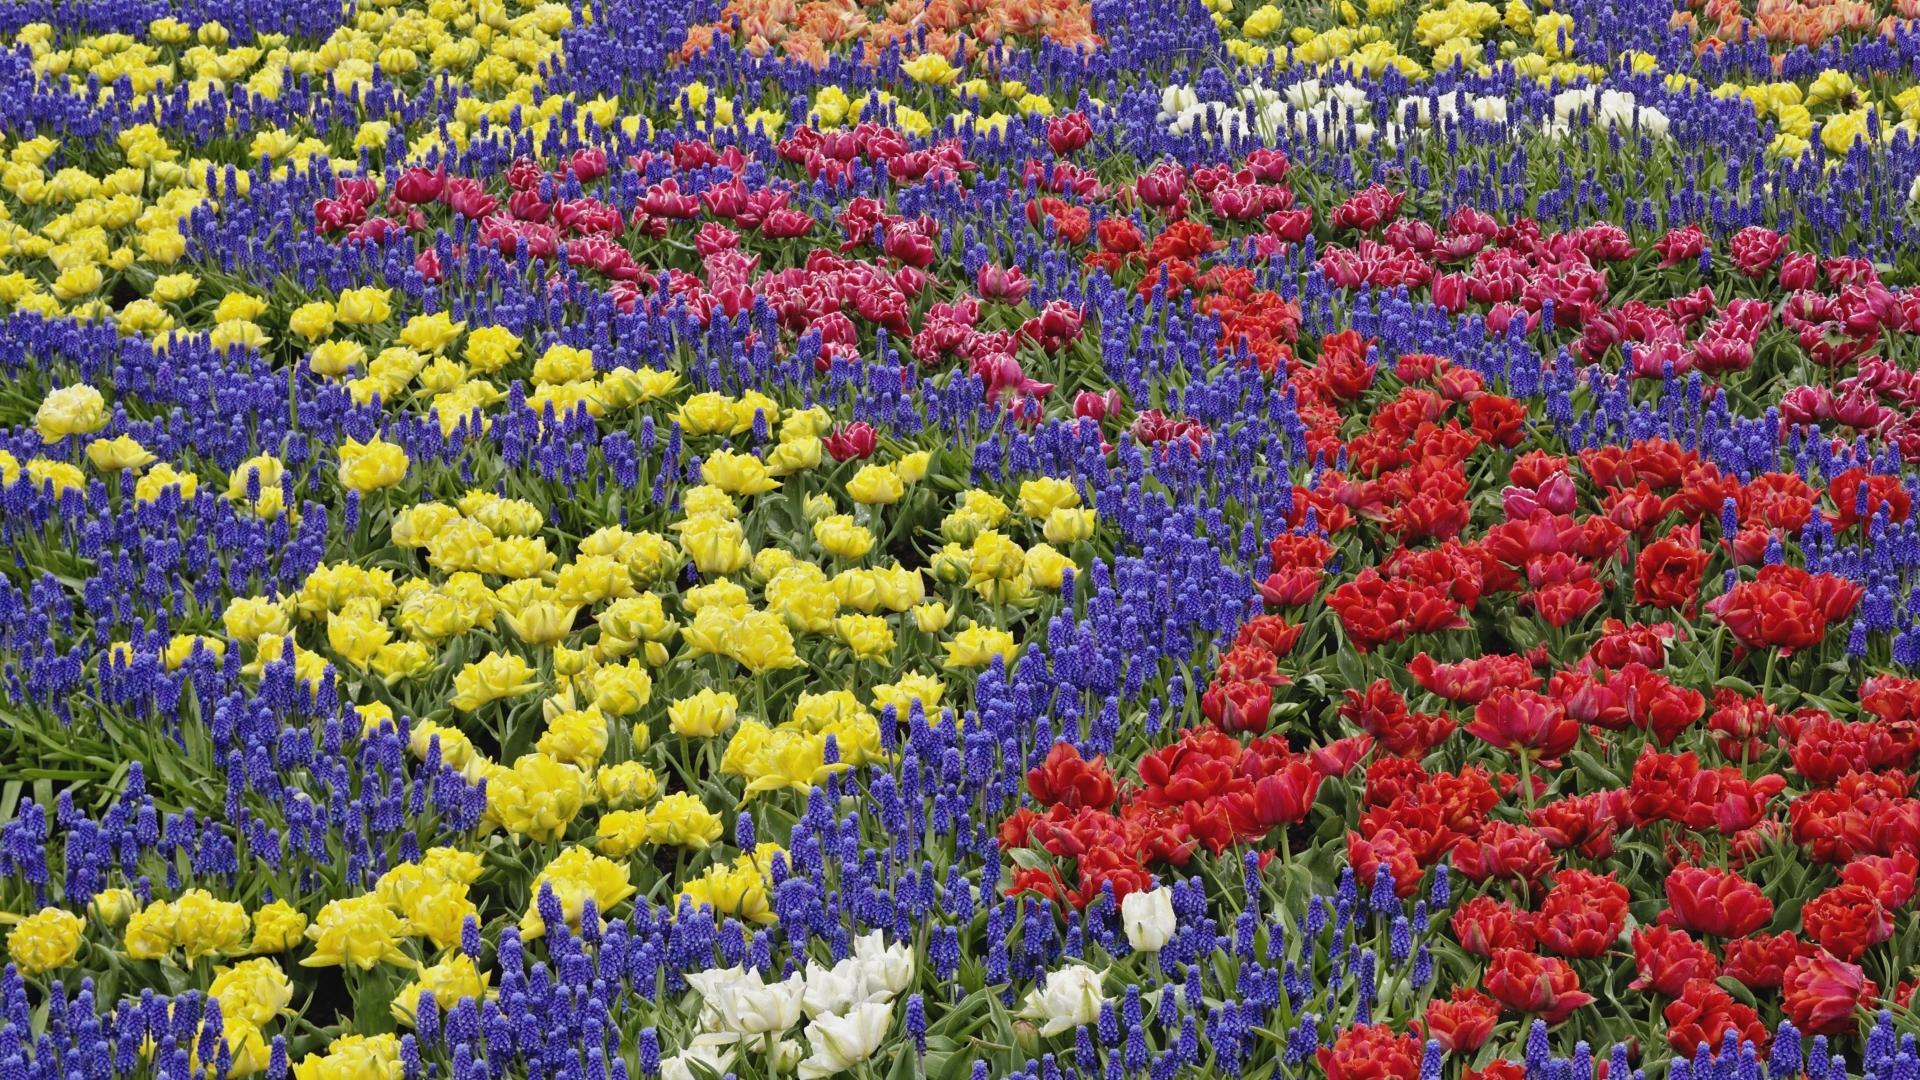 Fondos de pantalla : dibujo, Flores, Tulipanes, campo, Muscari ...